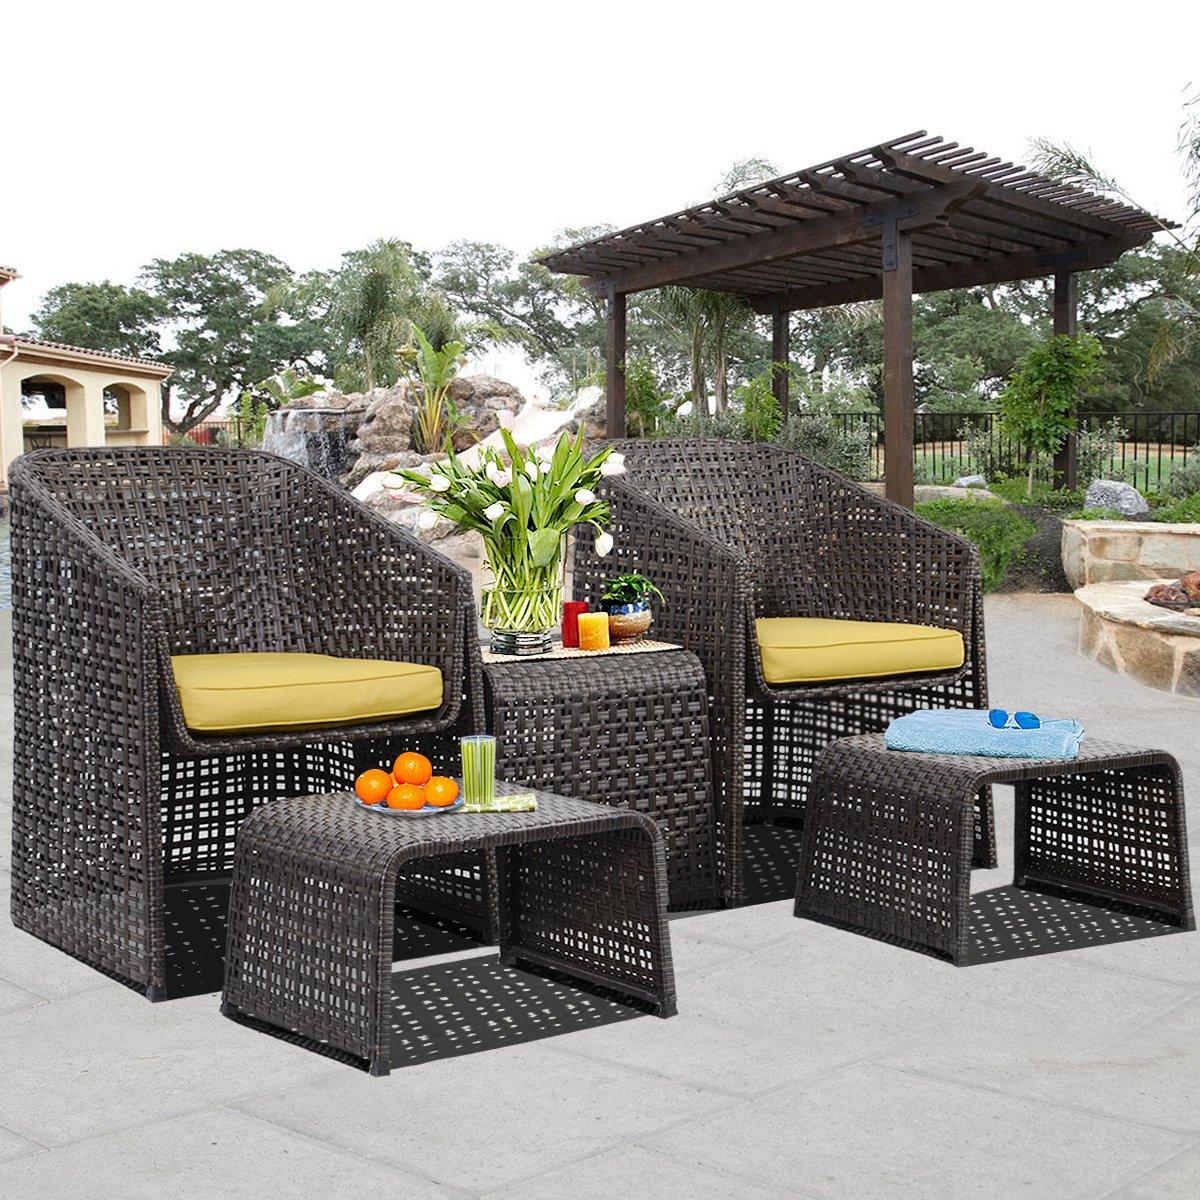 Amazon.de: Sitzgruppe Gartenmöbel Rattan Lounge Set Polyratten ...